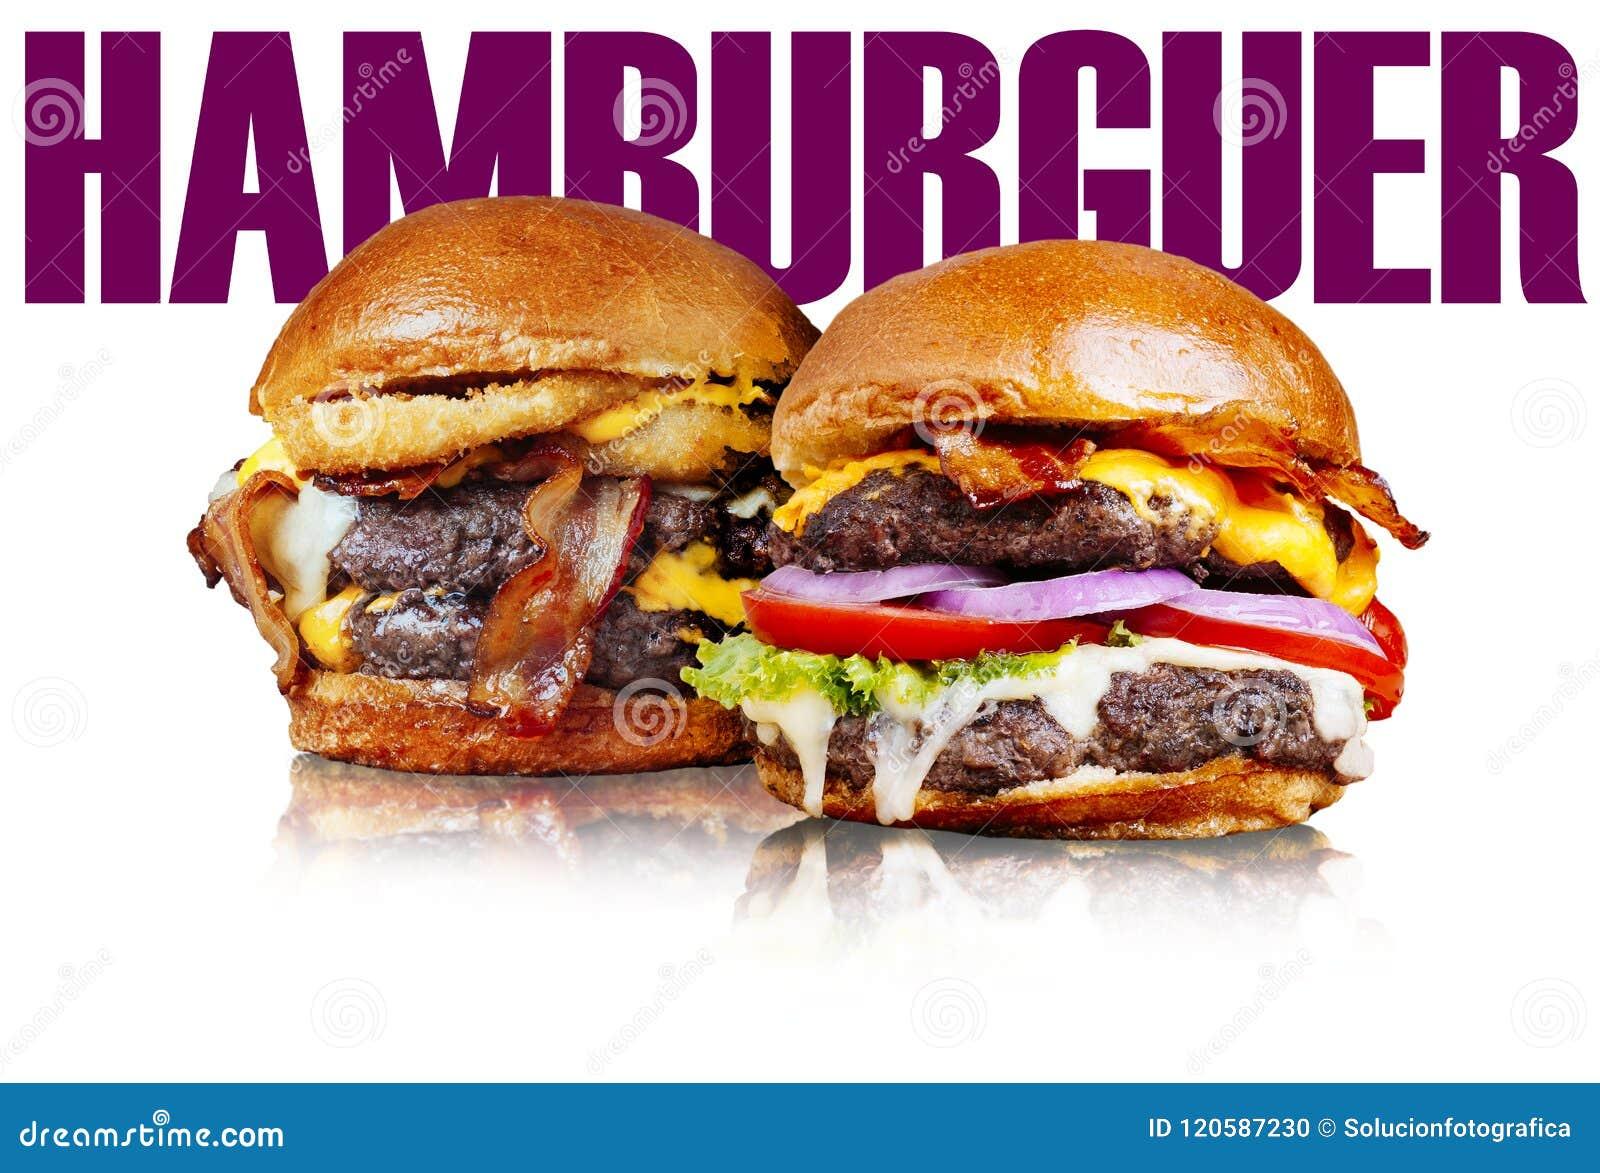 Hamburger Sign Stock Photo Image Of Letters Sign Closeup